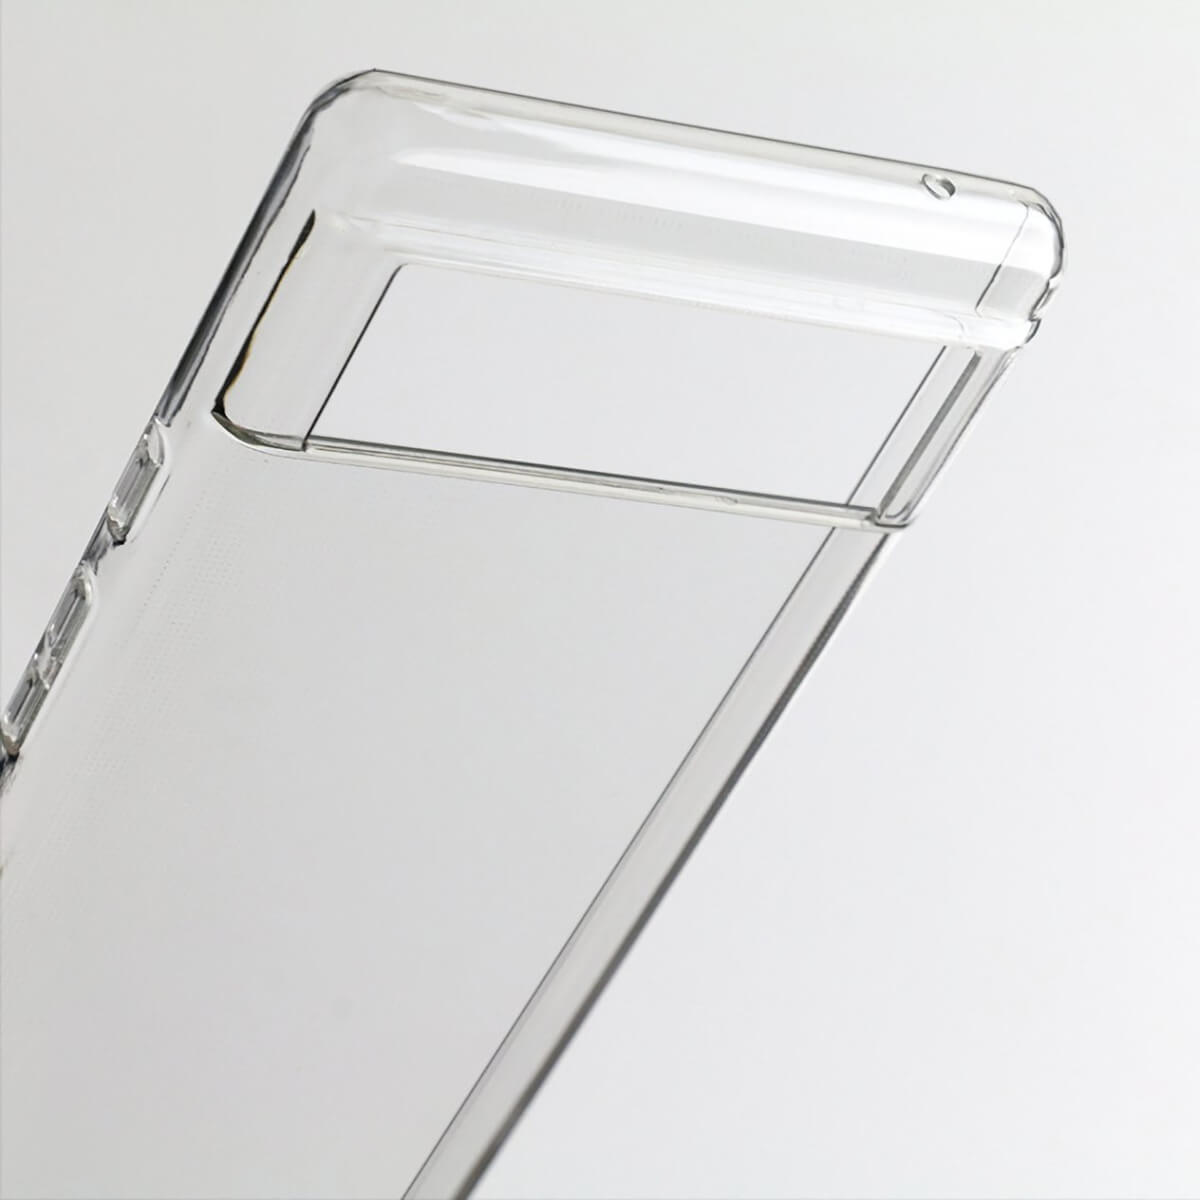 google pixel 6 case